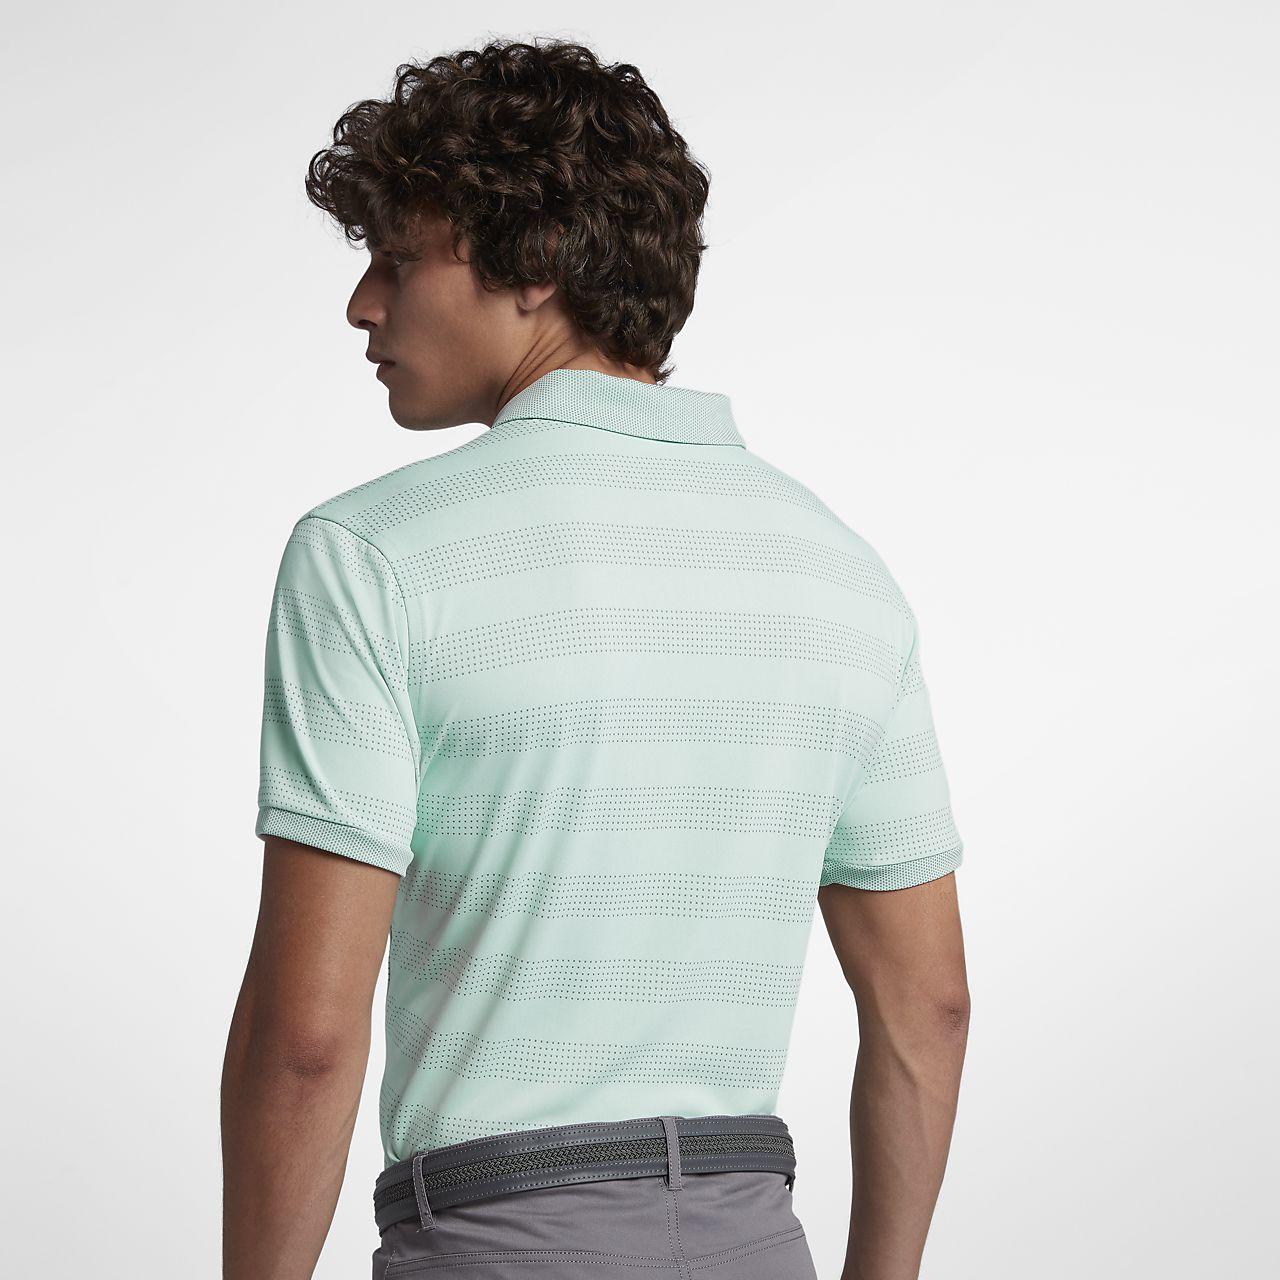 dc9aad1d6 Nike Tech Stripe Polo Shirt Mens - DREAMWORKS